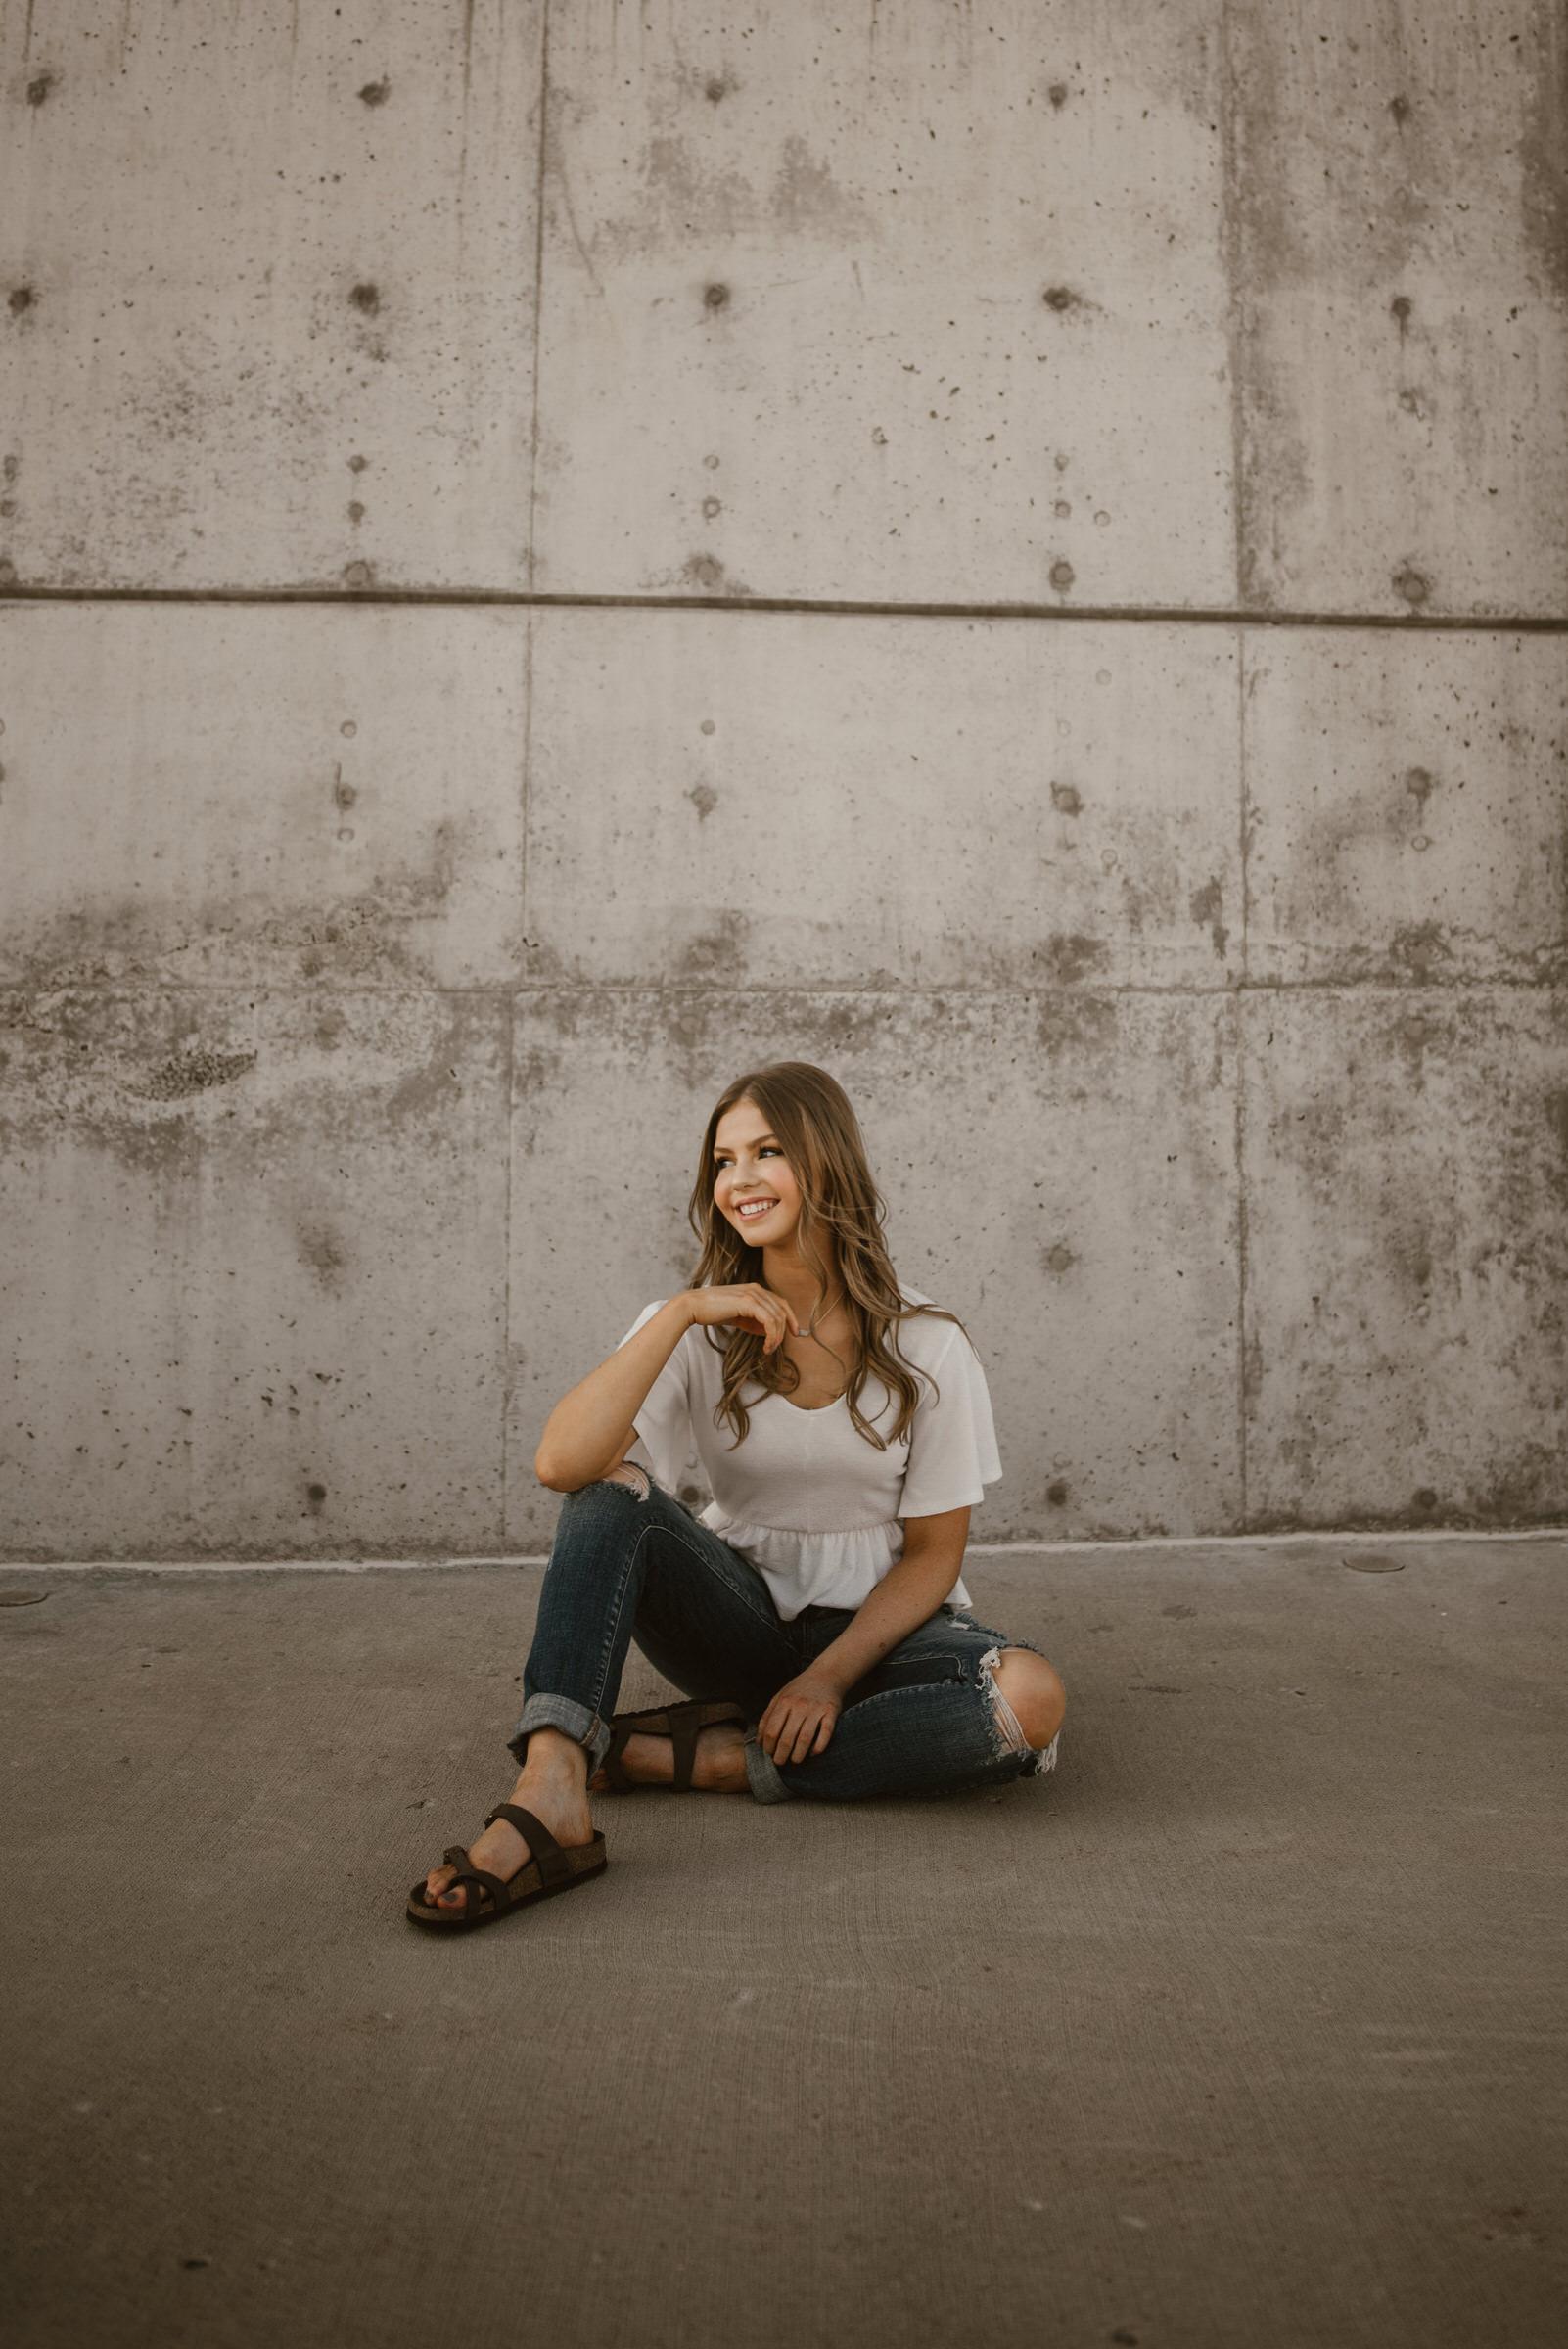 Kaylie-Sirek-Photography-Lincoln-Nebraska-Senior-026.jpg